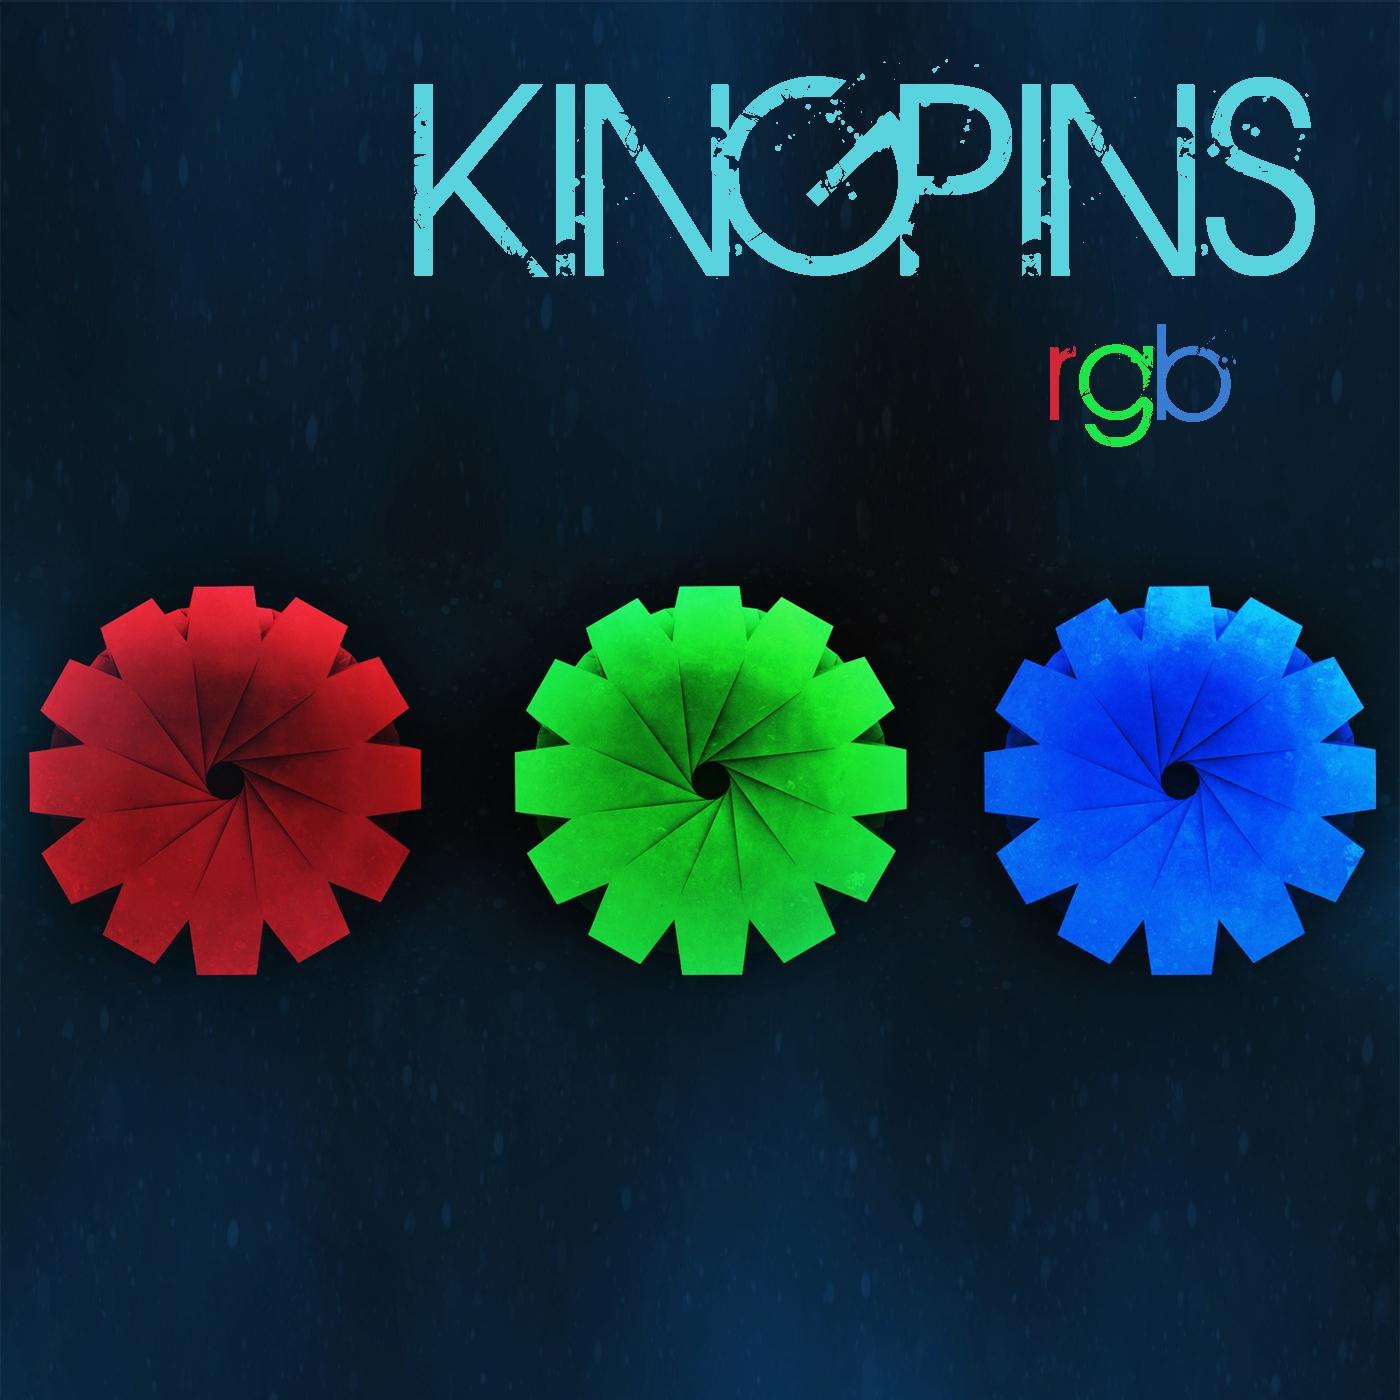 Kingpins - Rgb (Original Mix)